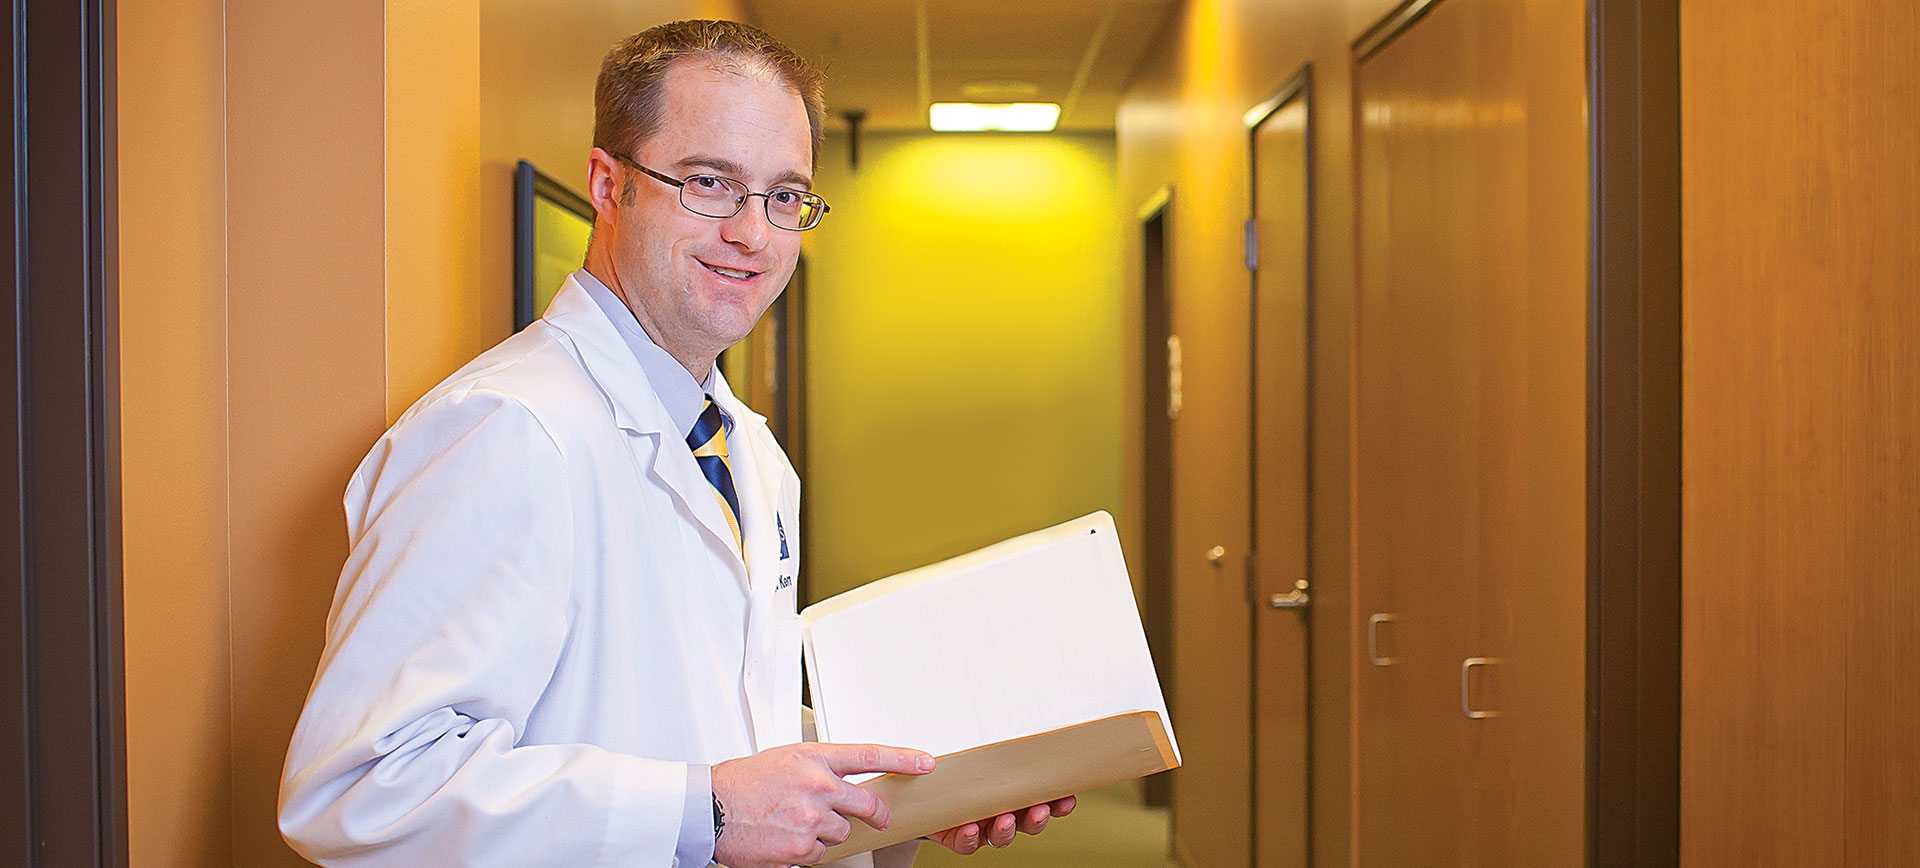 Dr. Jared Kern